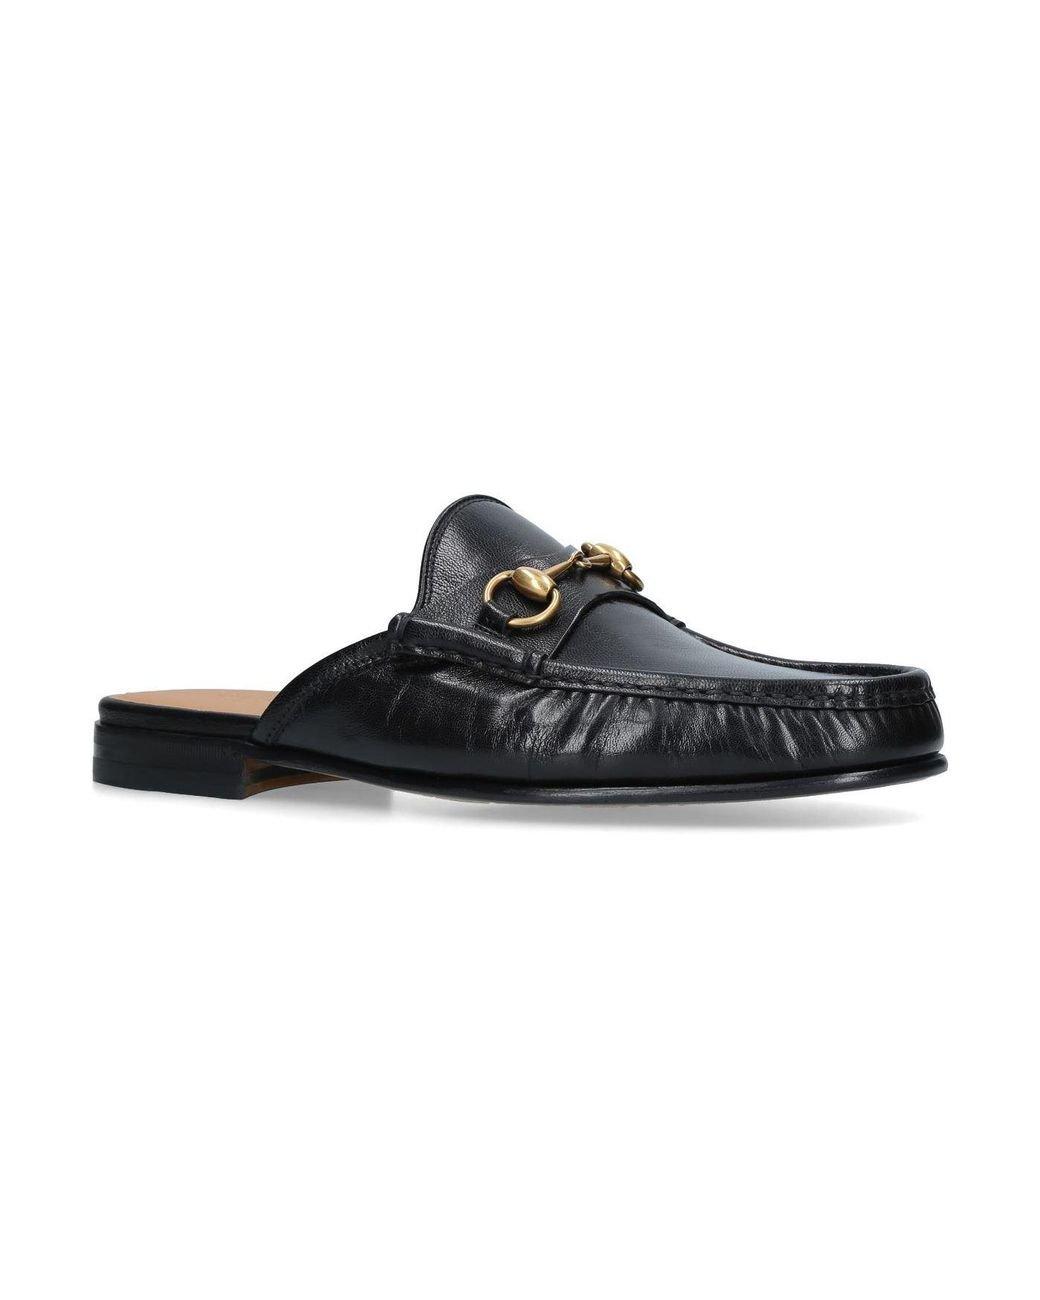 887e090cbb4 Lyst - Gucci Horsebit Leather Slipper in Black for Men - Save 6%